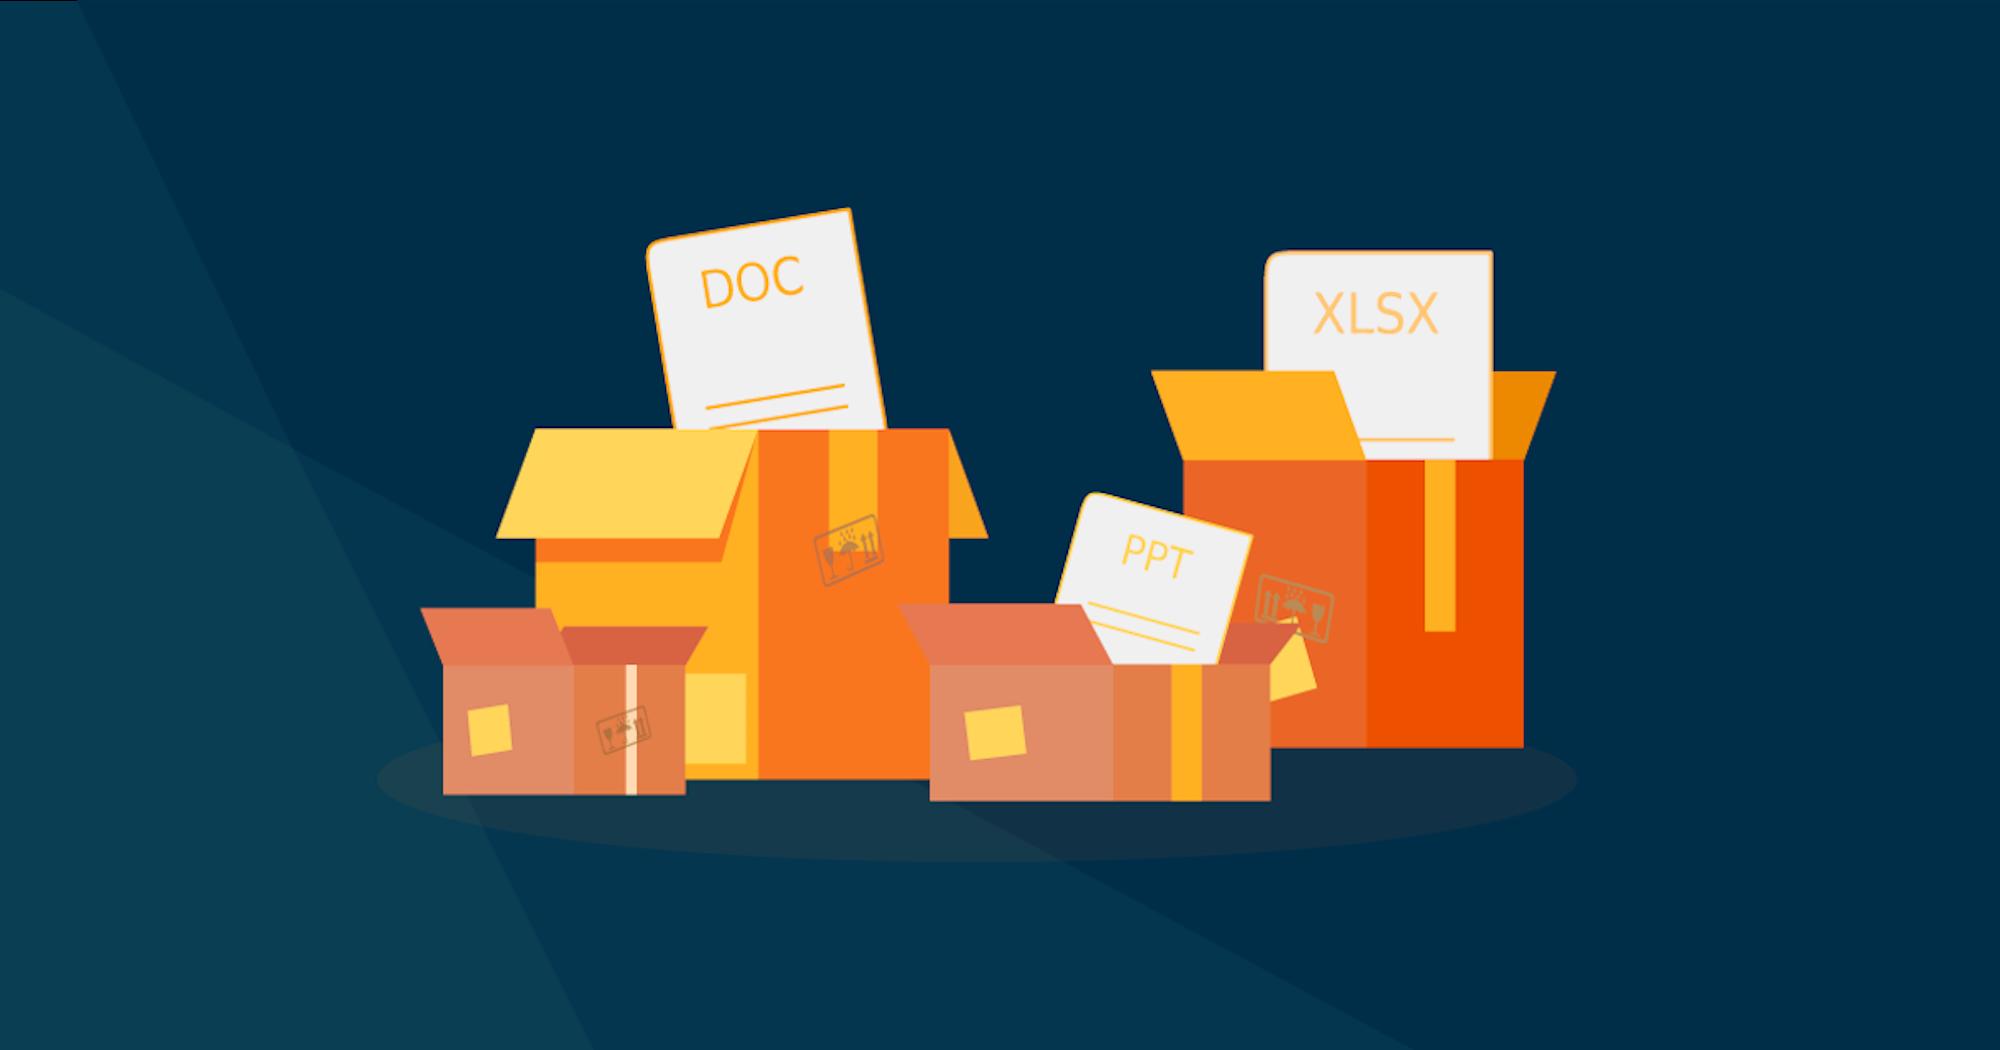 Alternativas a dropbox gratuitas para compartir archivos